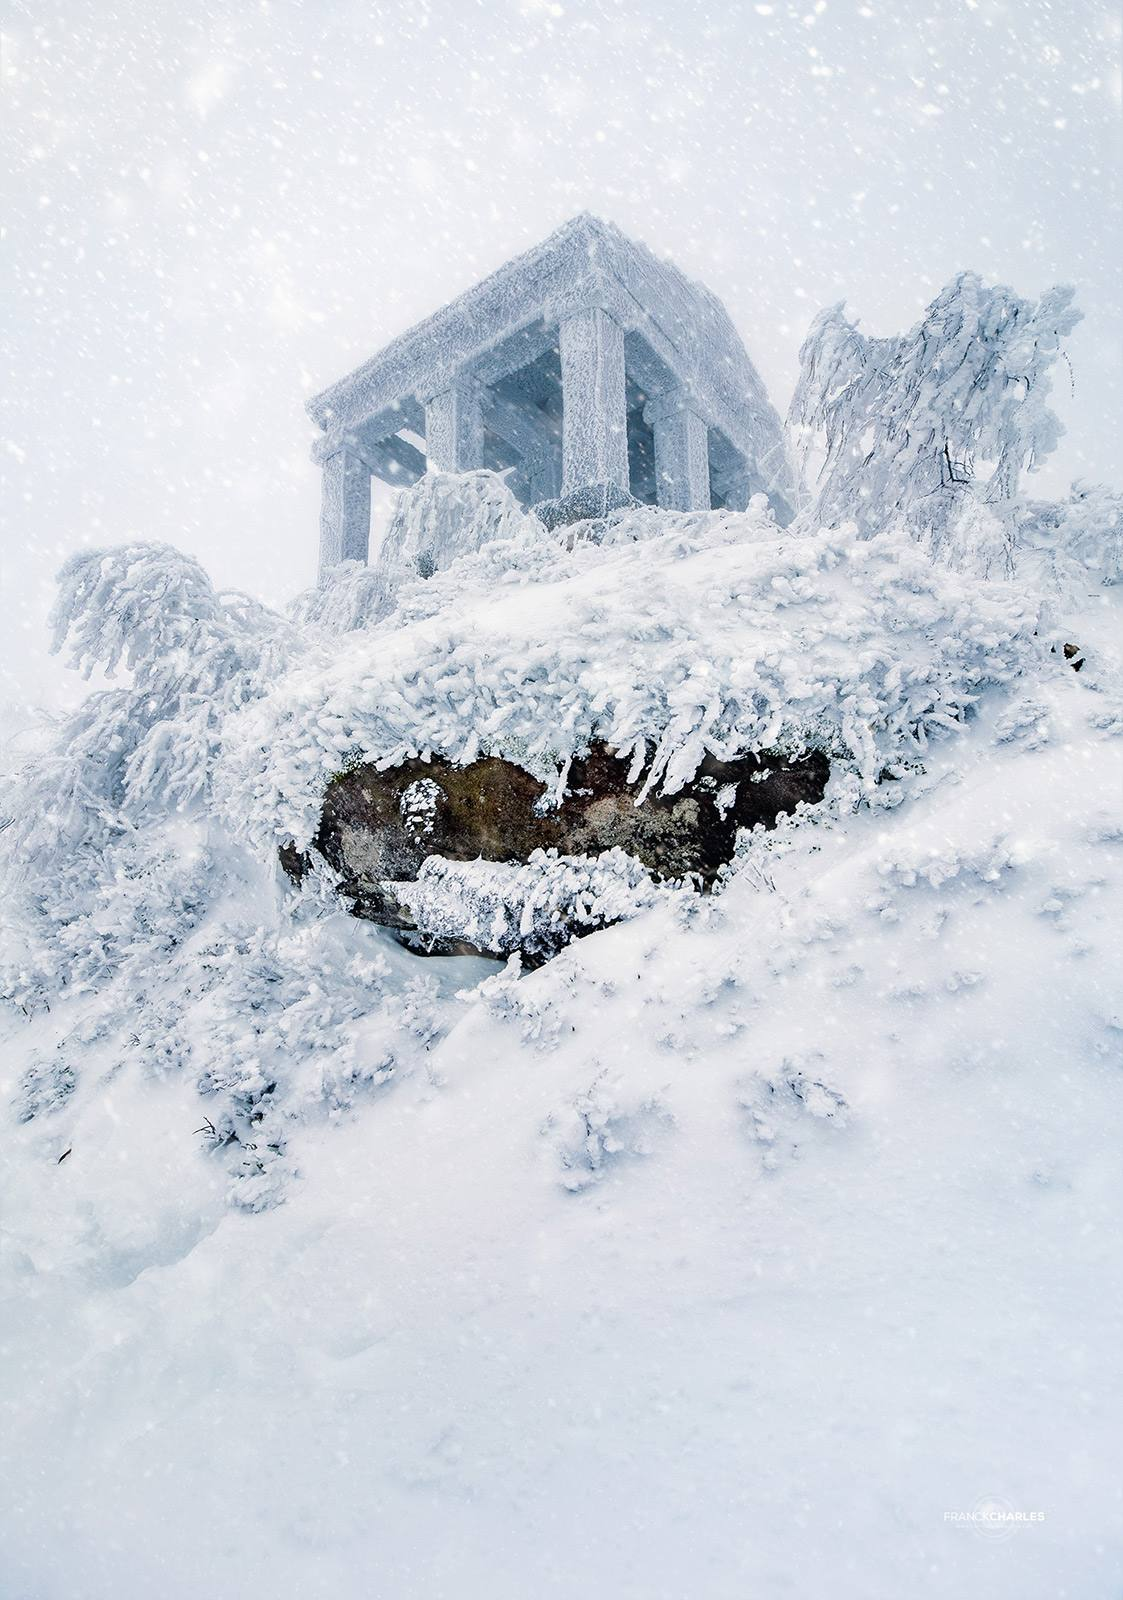 Donon hivernal © Franck CHARLES